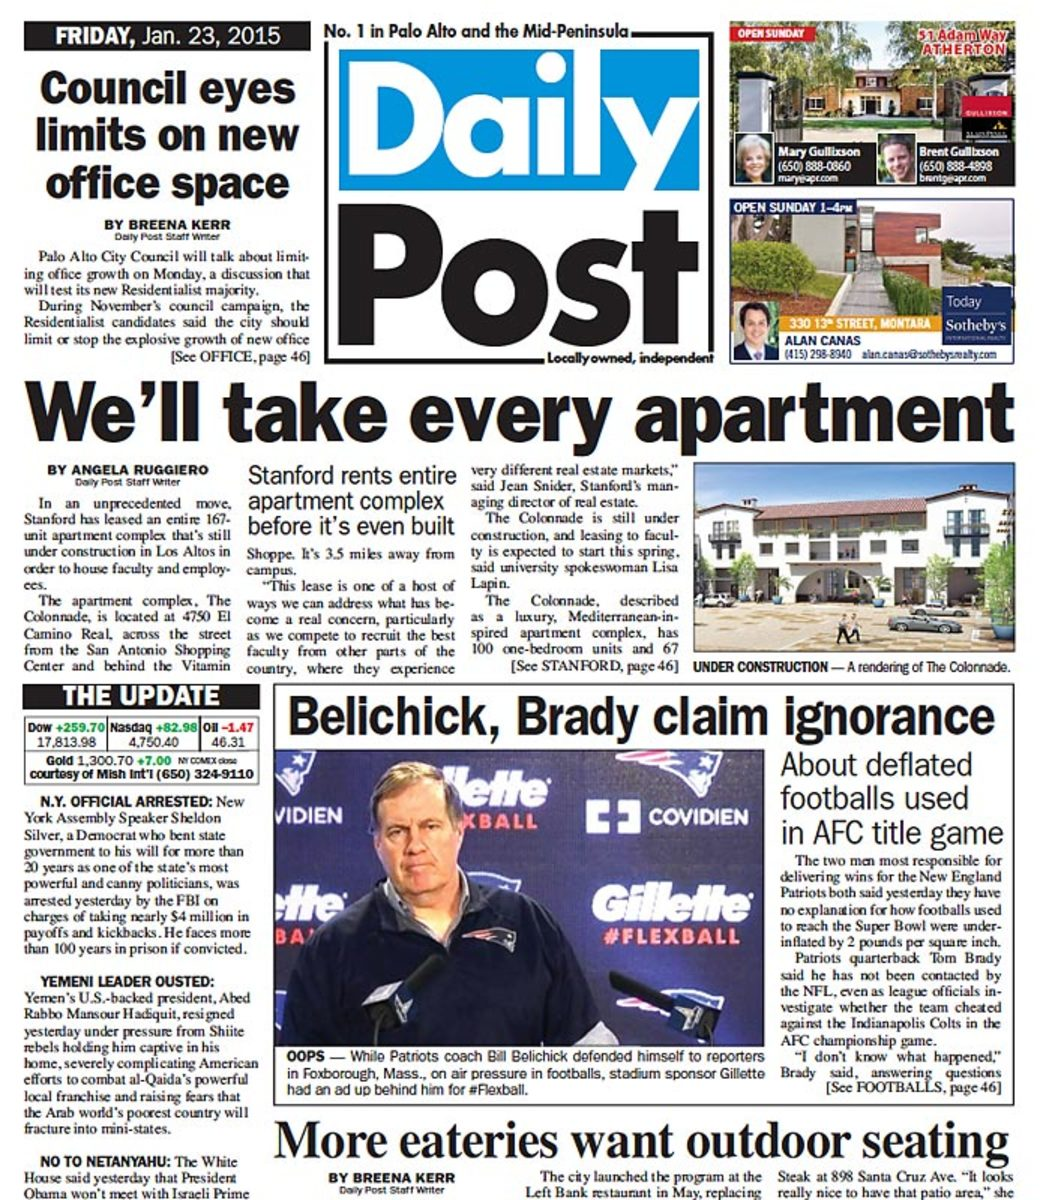 deflategate-newspapers-at-1.33.32-PM.jpg